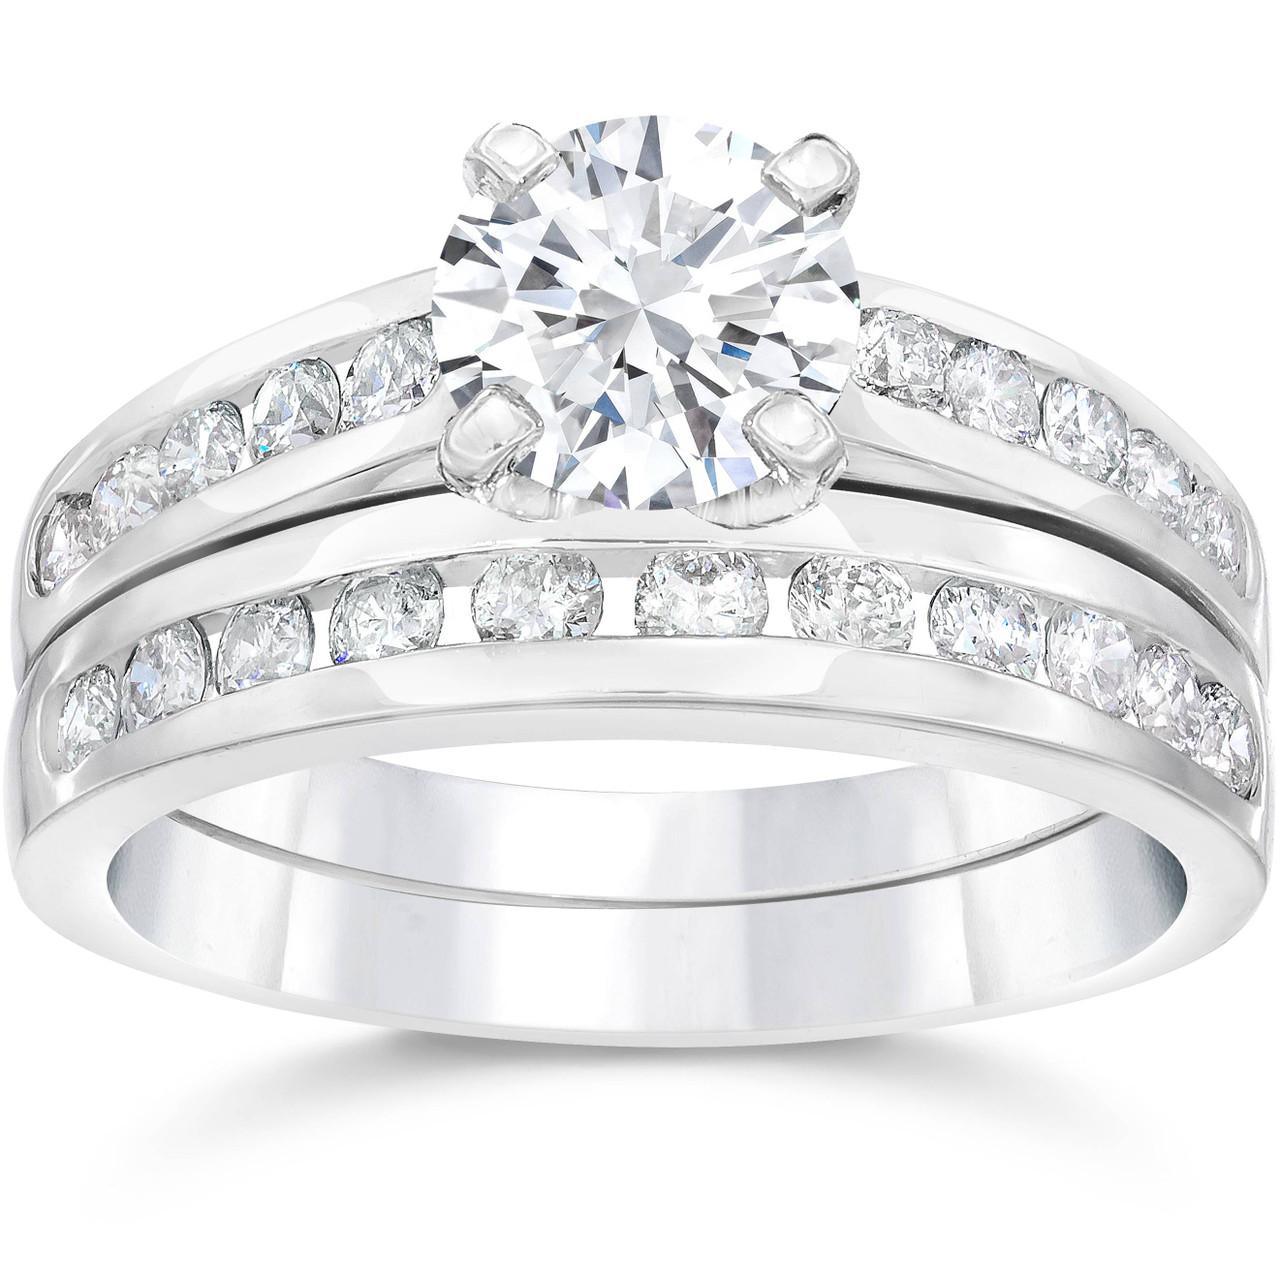 2 solitaire diamond ring